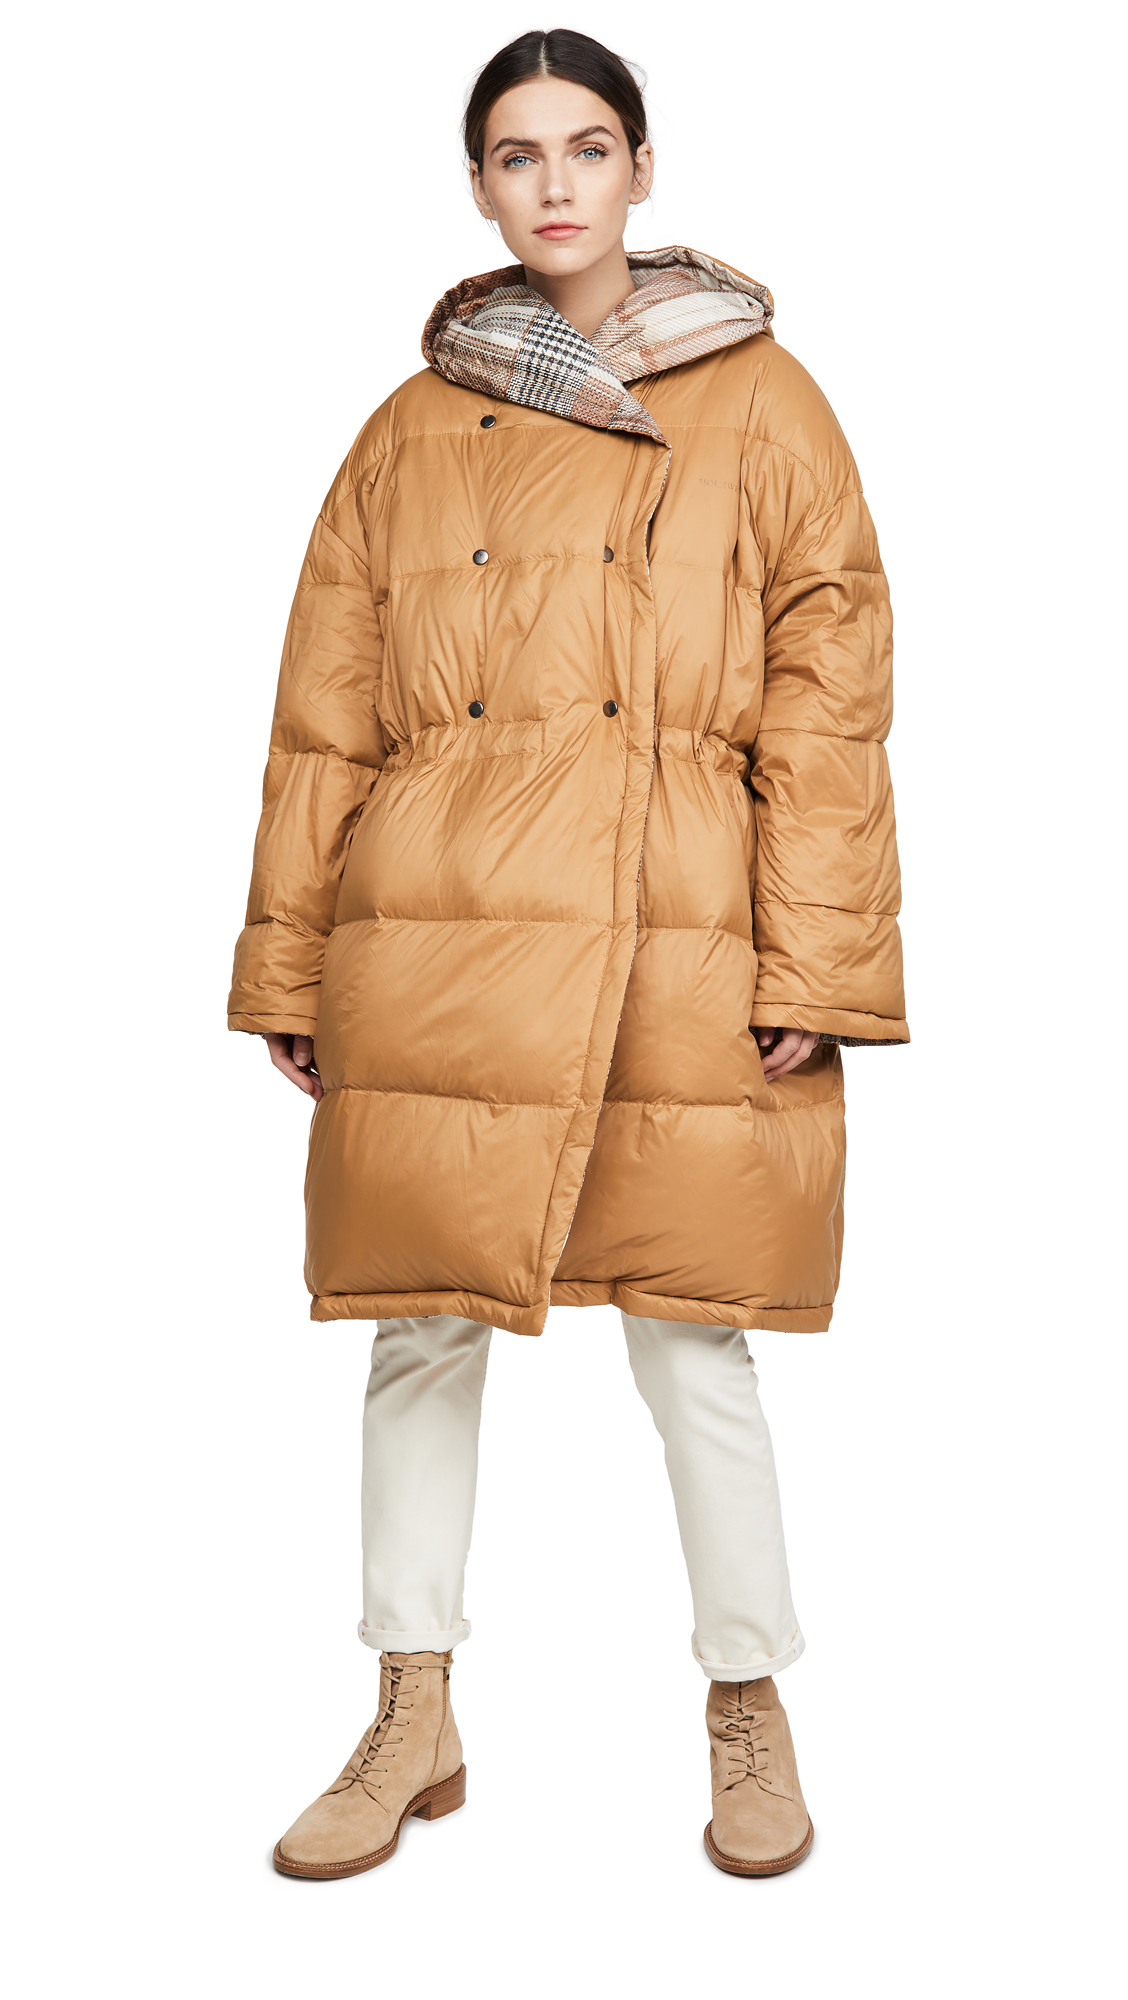 Buy HOLZWEILER Dosy Jacket online beautiful HOLZWEILER Jackets, Coats, Down Jackets